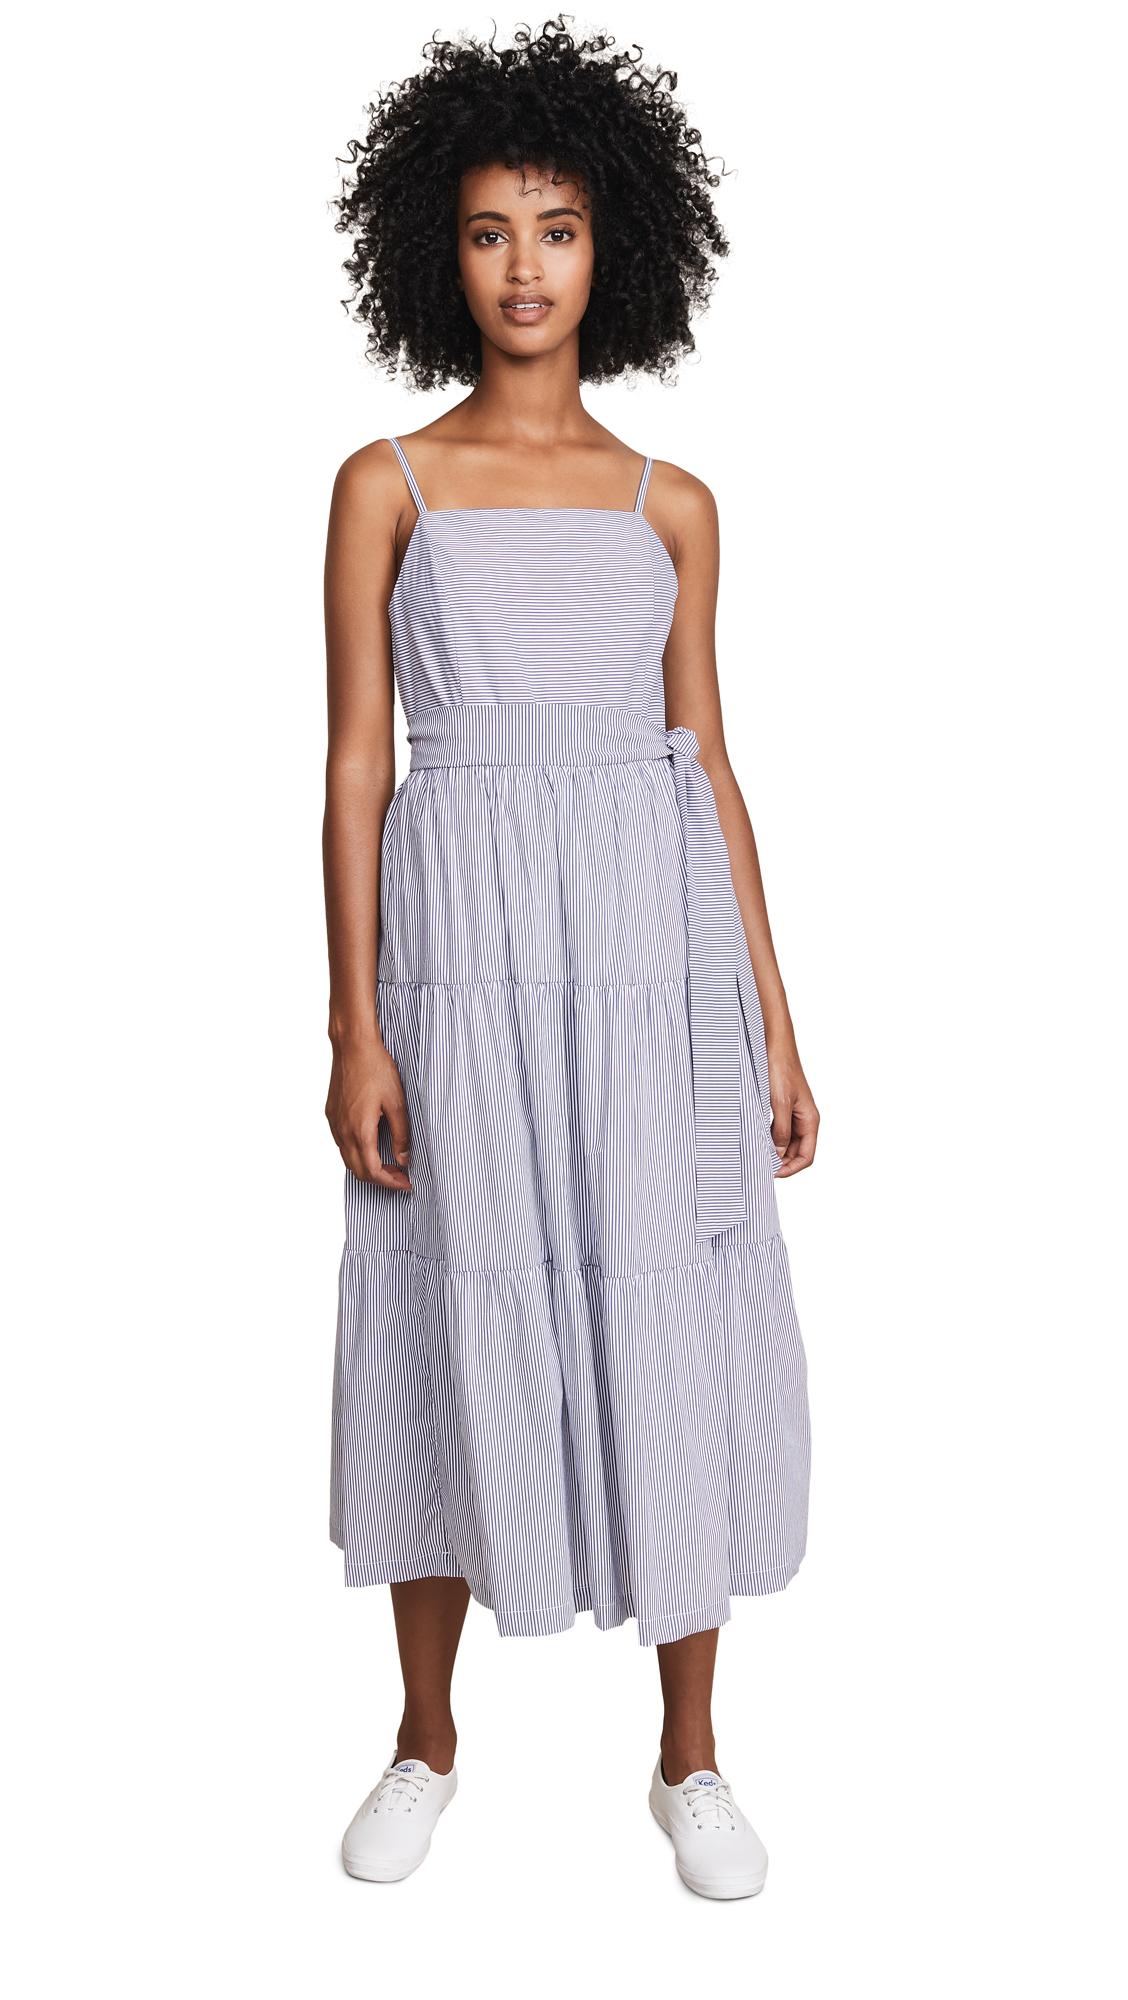 ENGLISH FACTORY Shirred Midi Dress with Ribbon - Night Sky